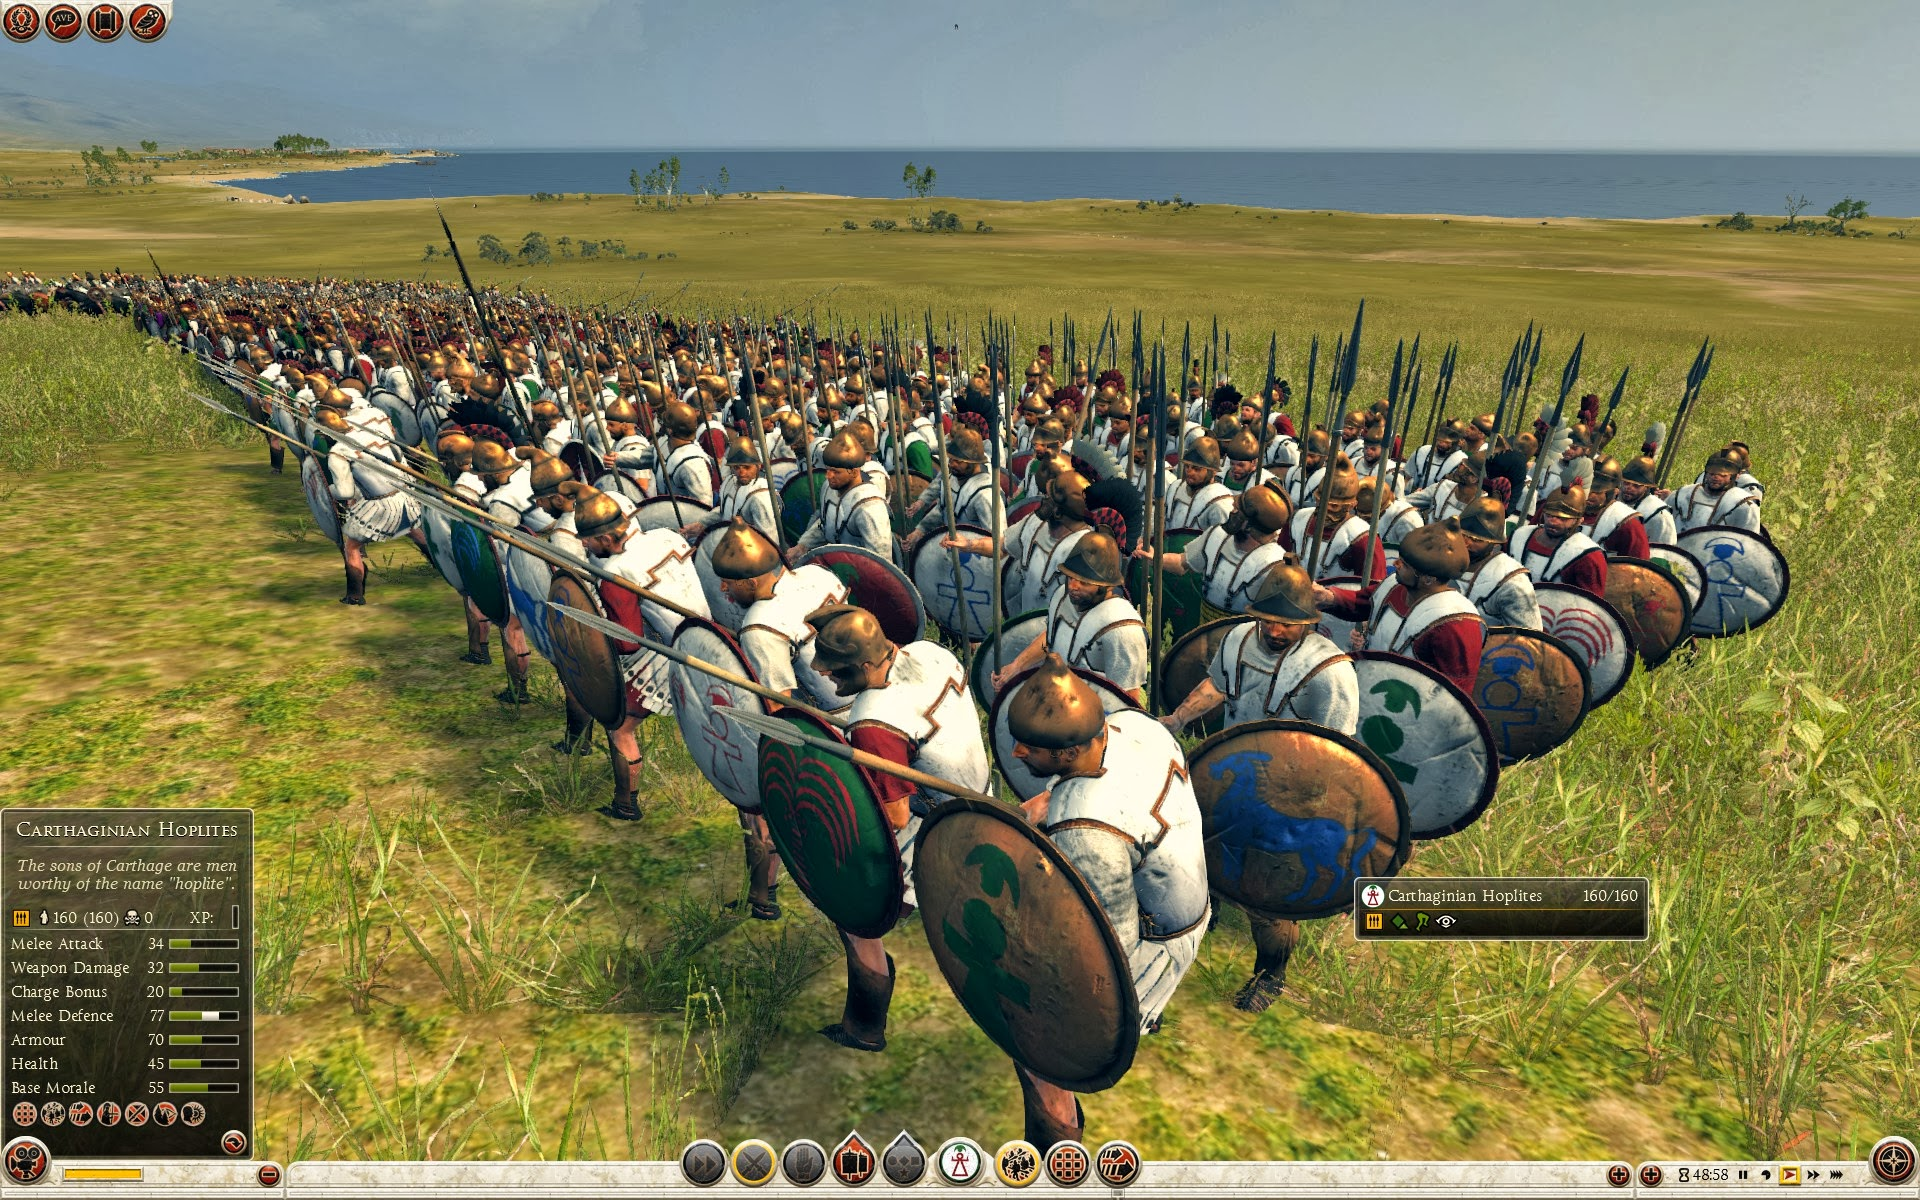 Carthaginian Hoplites   Total War Wiki   FANDOM powered by ...